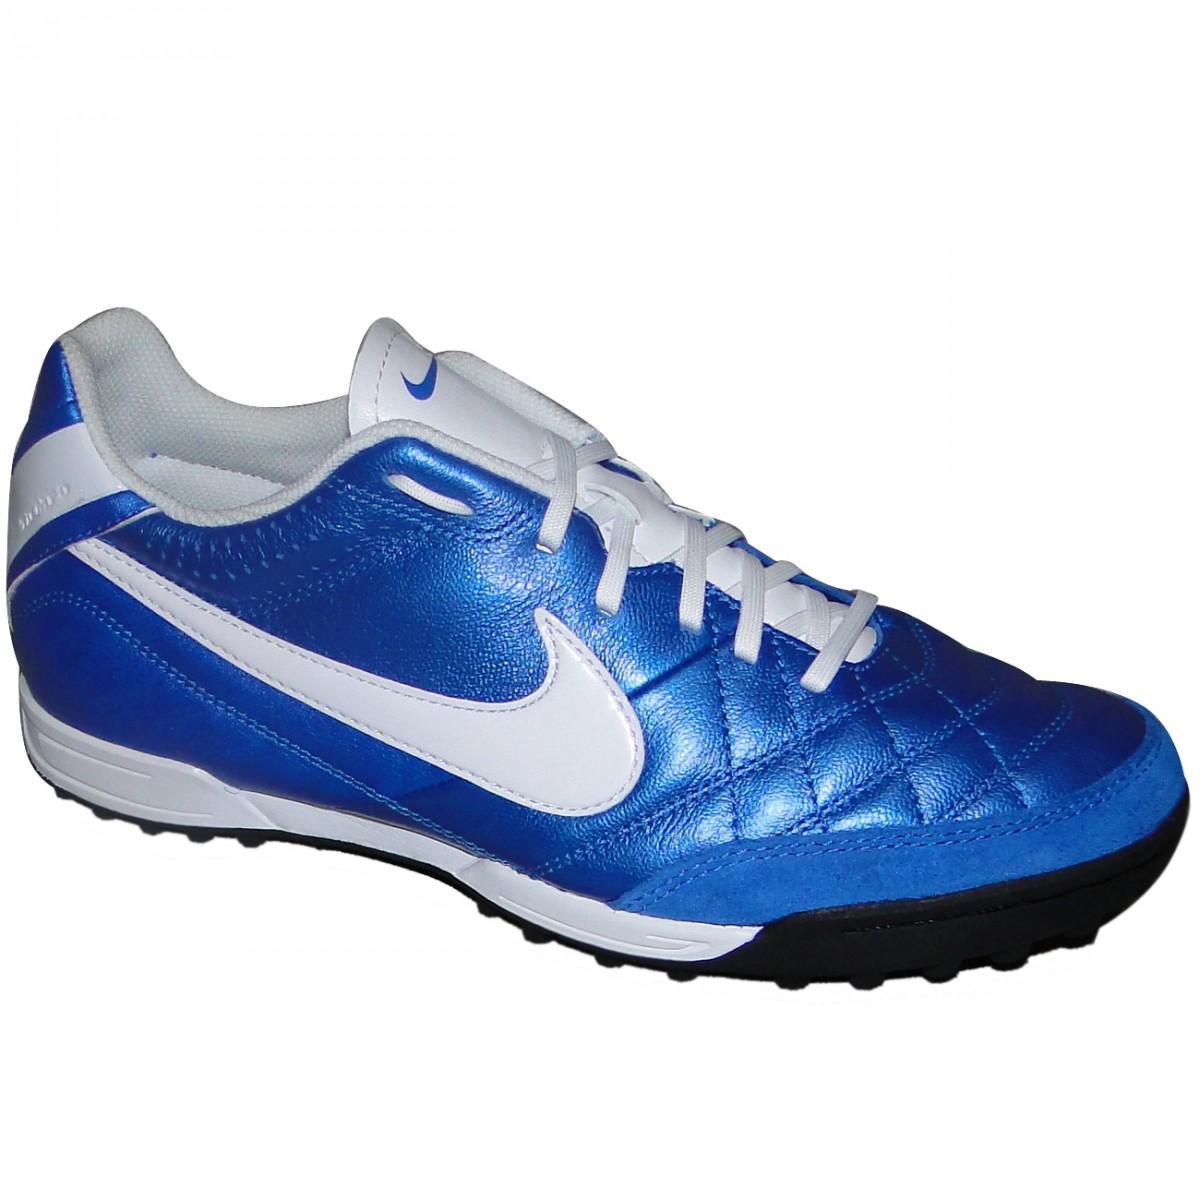 Chuteira Society Nike Tiempo Natural Iv 509089-419 - Azul Branco - Chuteira  Nike 674e2031fb6dc